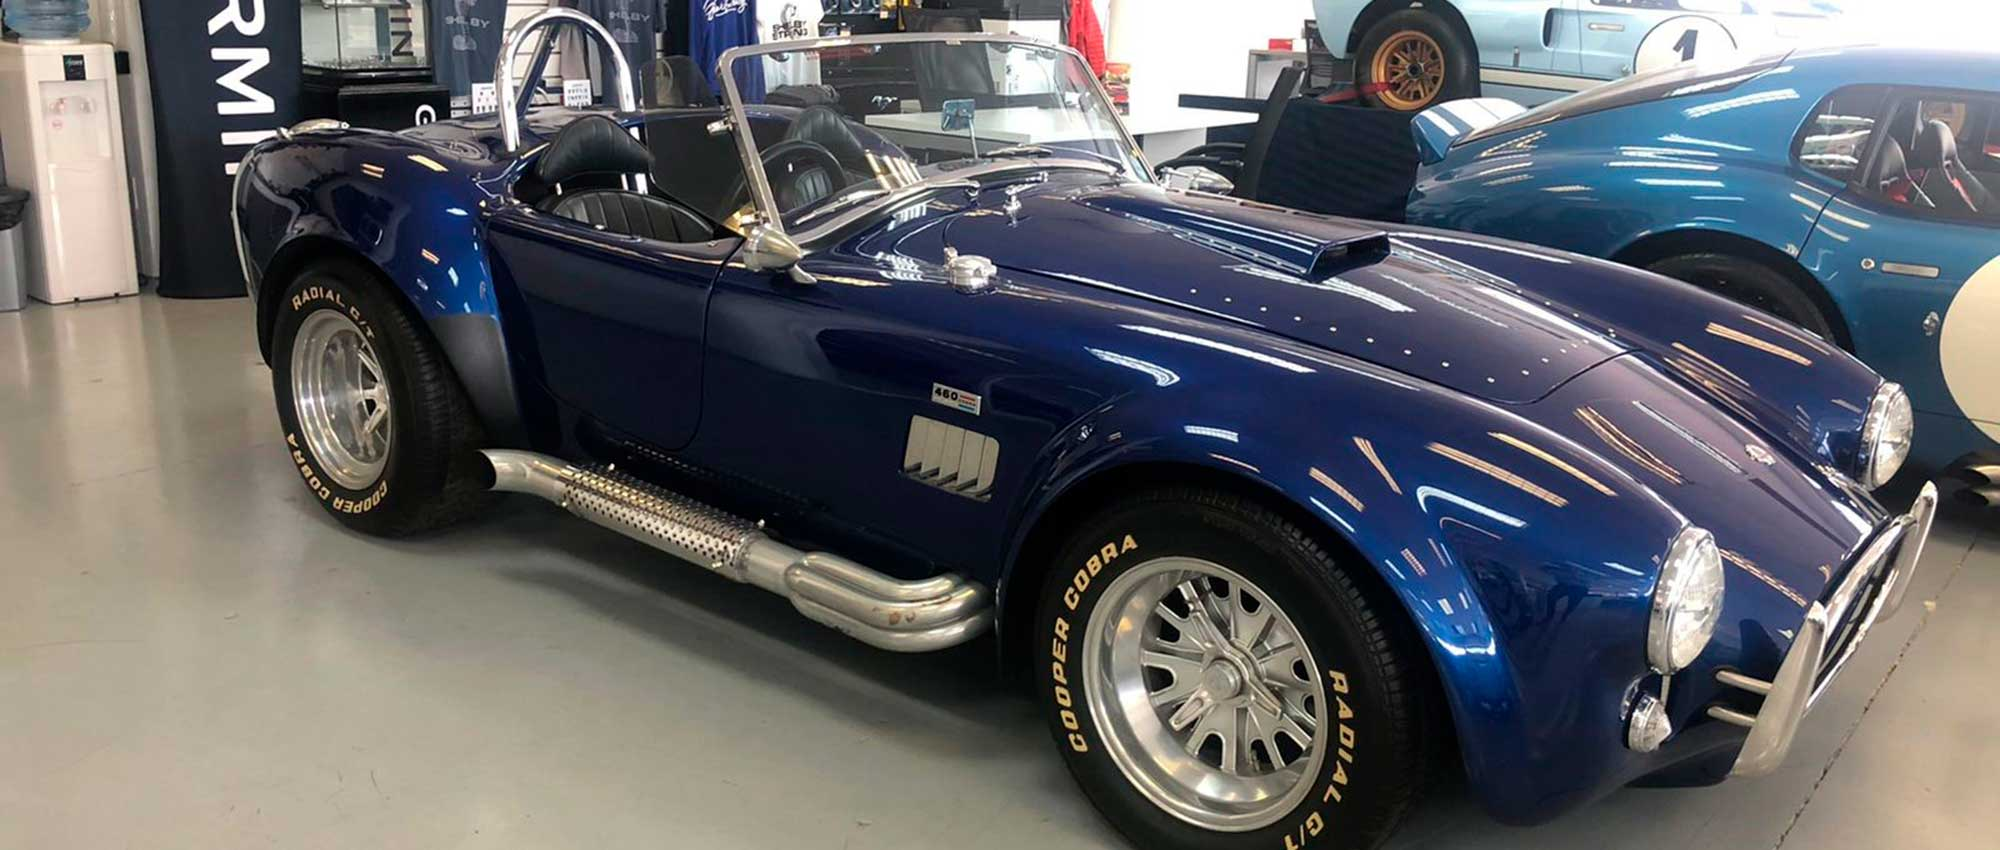 Charles-Needham---1998-Superformance-Shelby-Cobra-MkIII---1